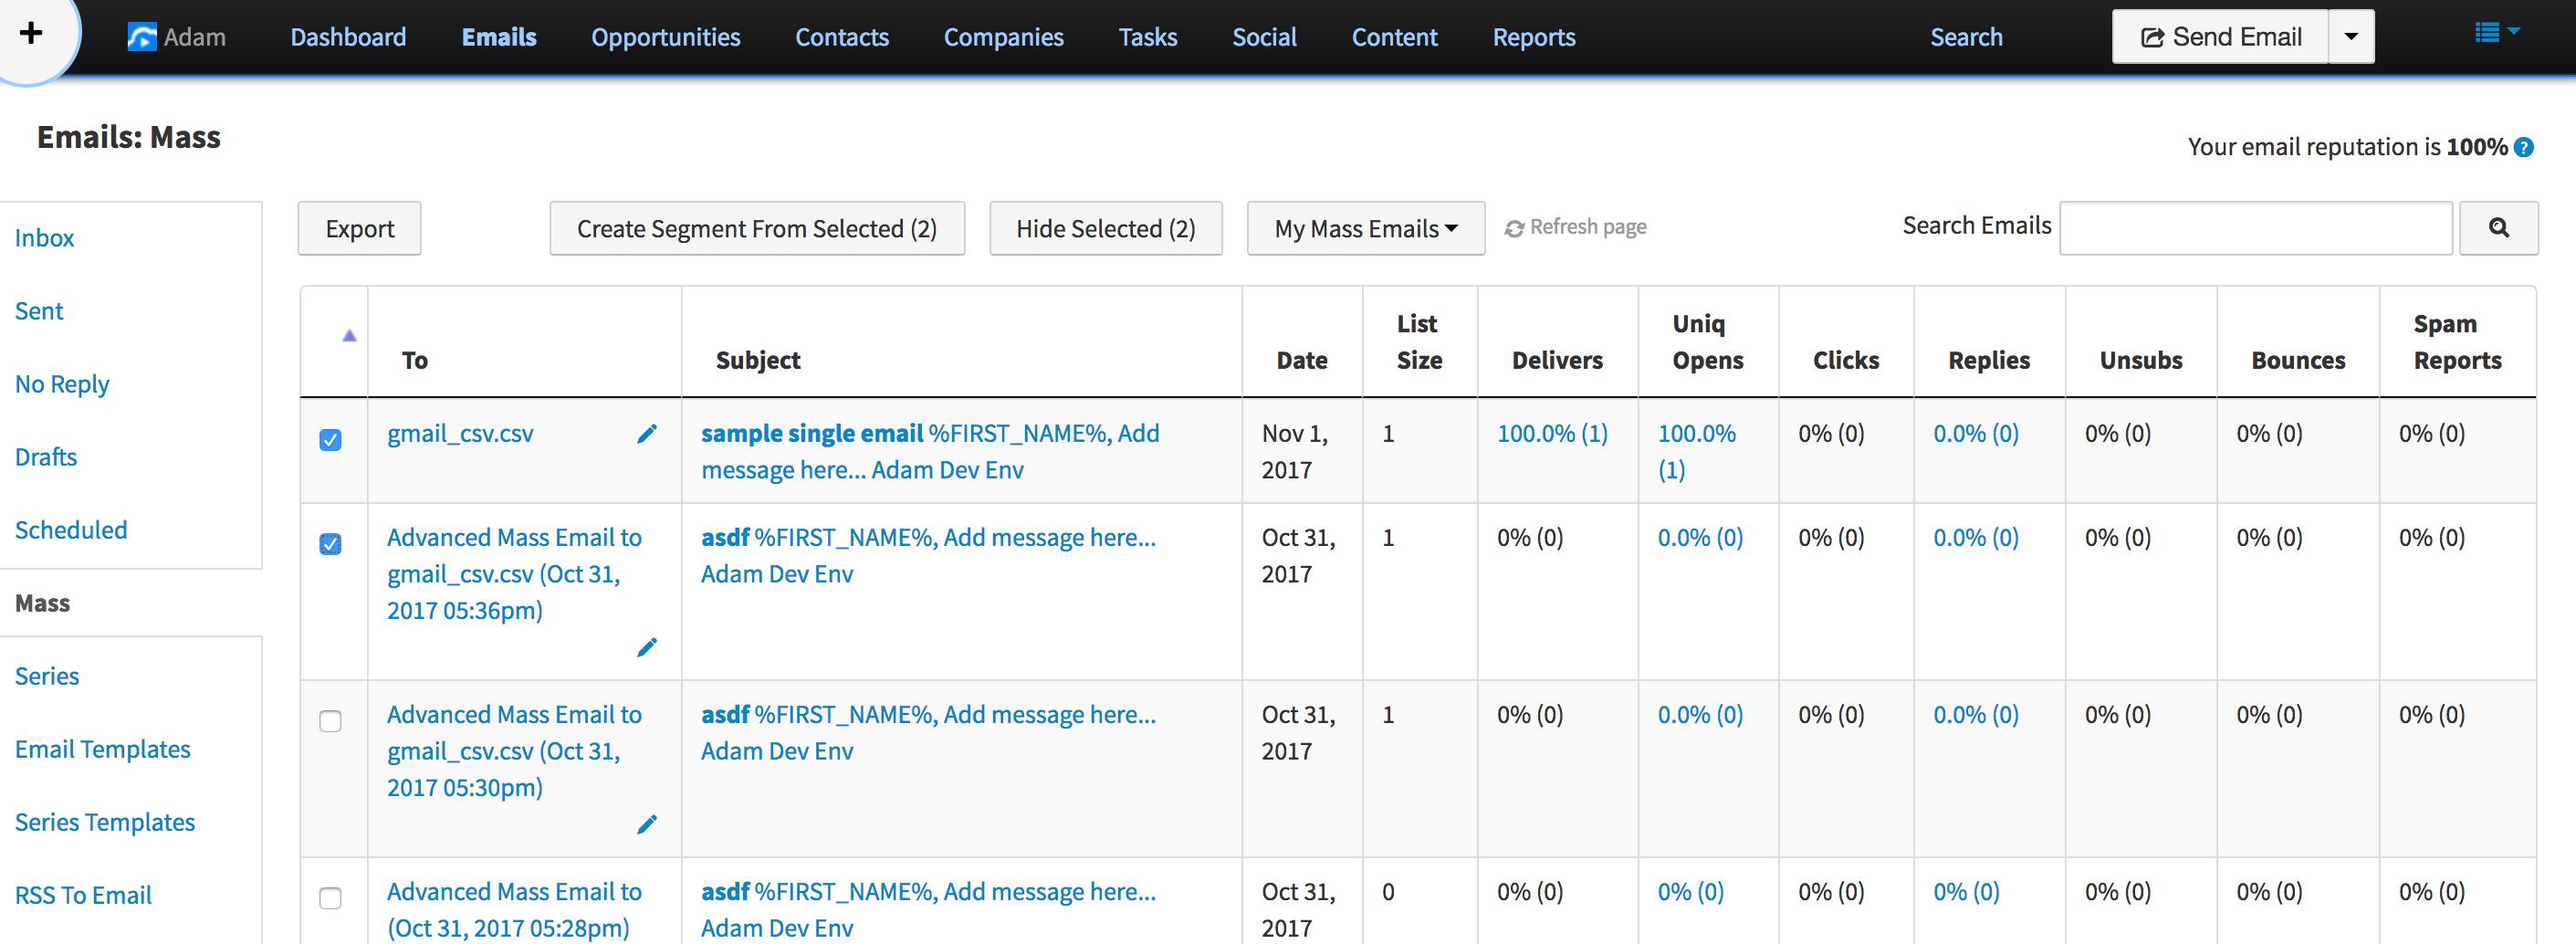 Bulk email management and segmenting